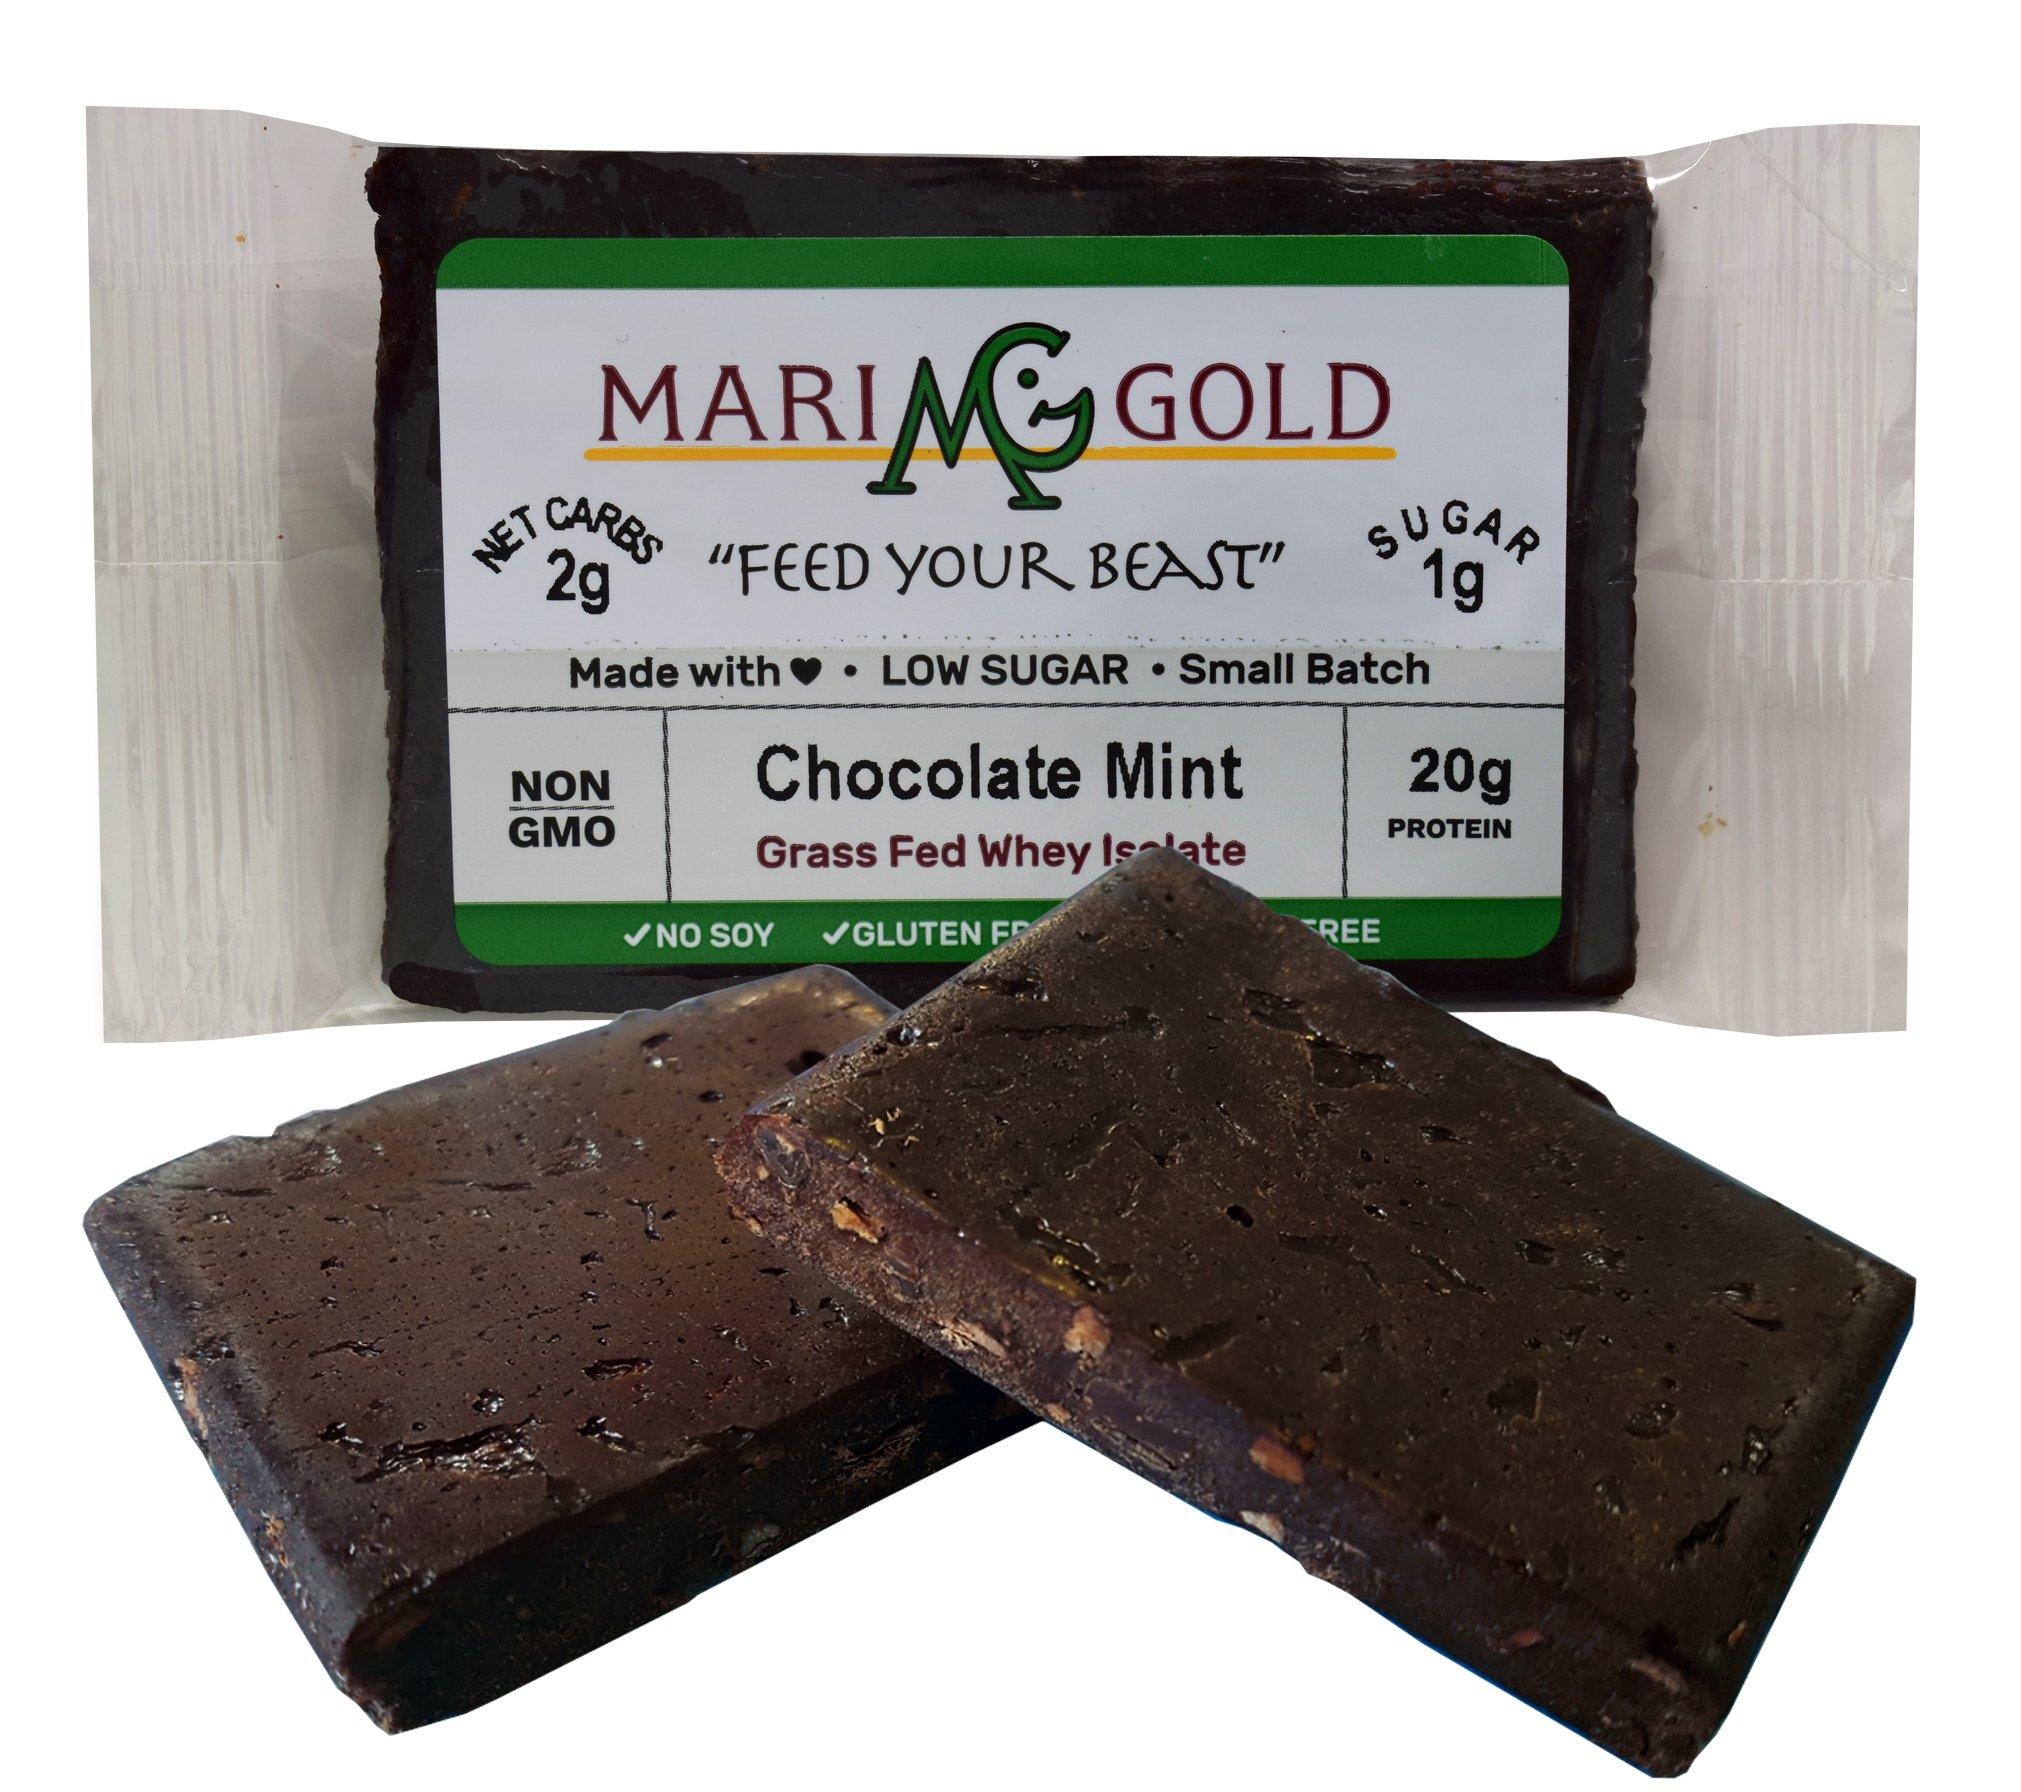 Keto (2-3 NET CARB) Protein Bar by MariGold - Amazing Taste Ketogenic Snacks - Organic Fats, 1 g Sugar, 21 g Protein GRASS FED Whey - Non GMO. Made Fresh, Ships Fresh. (12 bars) by MariGold Bars (Image #4)